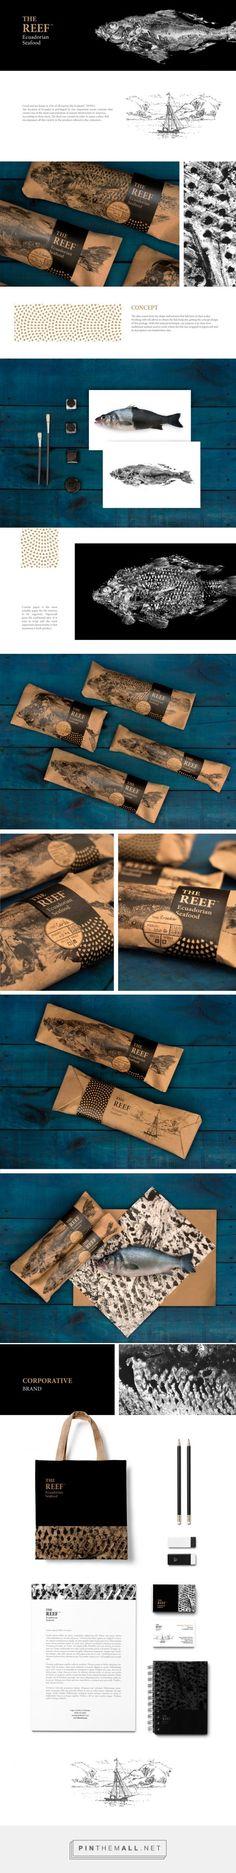 identity / food / THE REEF Ecuadaorian seafood Branding and Packaging by Kubu Design | Fivestar Branding Agency – Design and Branding Agency & Curated Inspiration Gallery